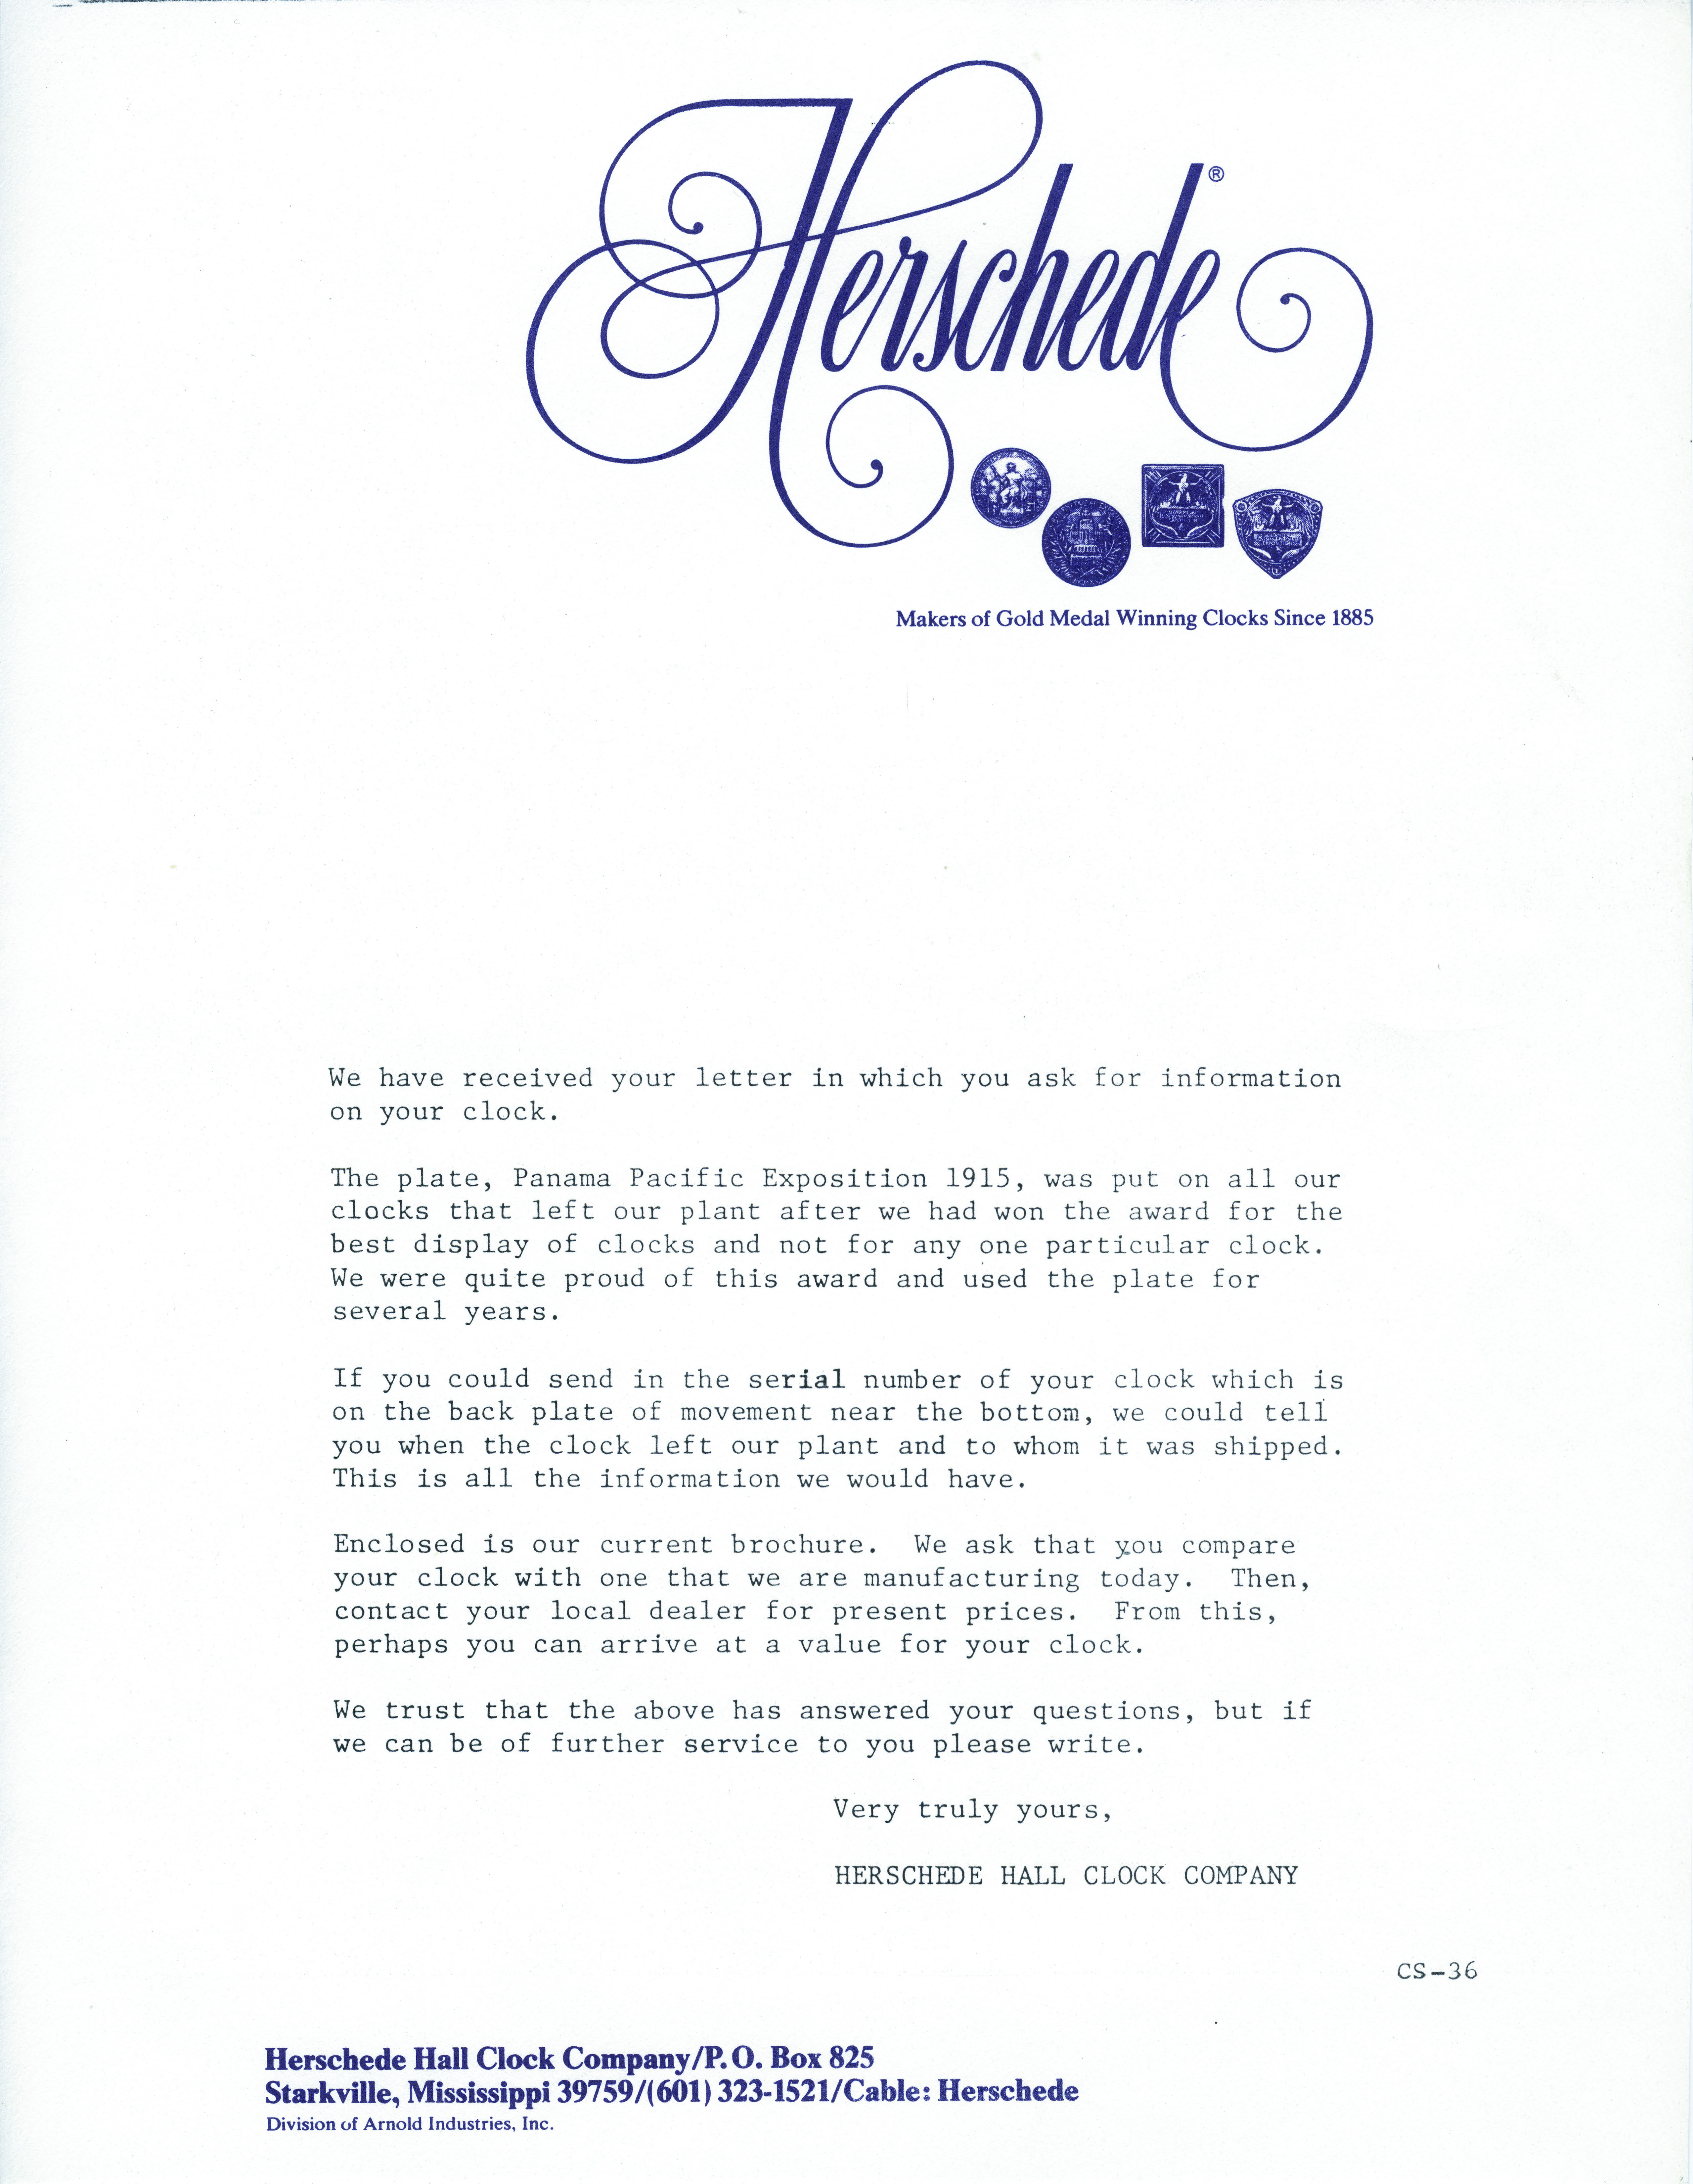 1915-panama-expo-plaque-letter.jpg